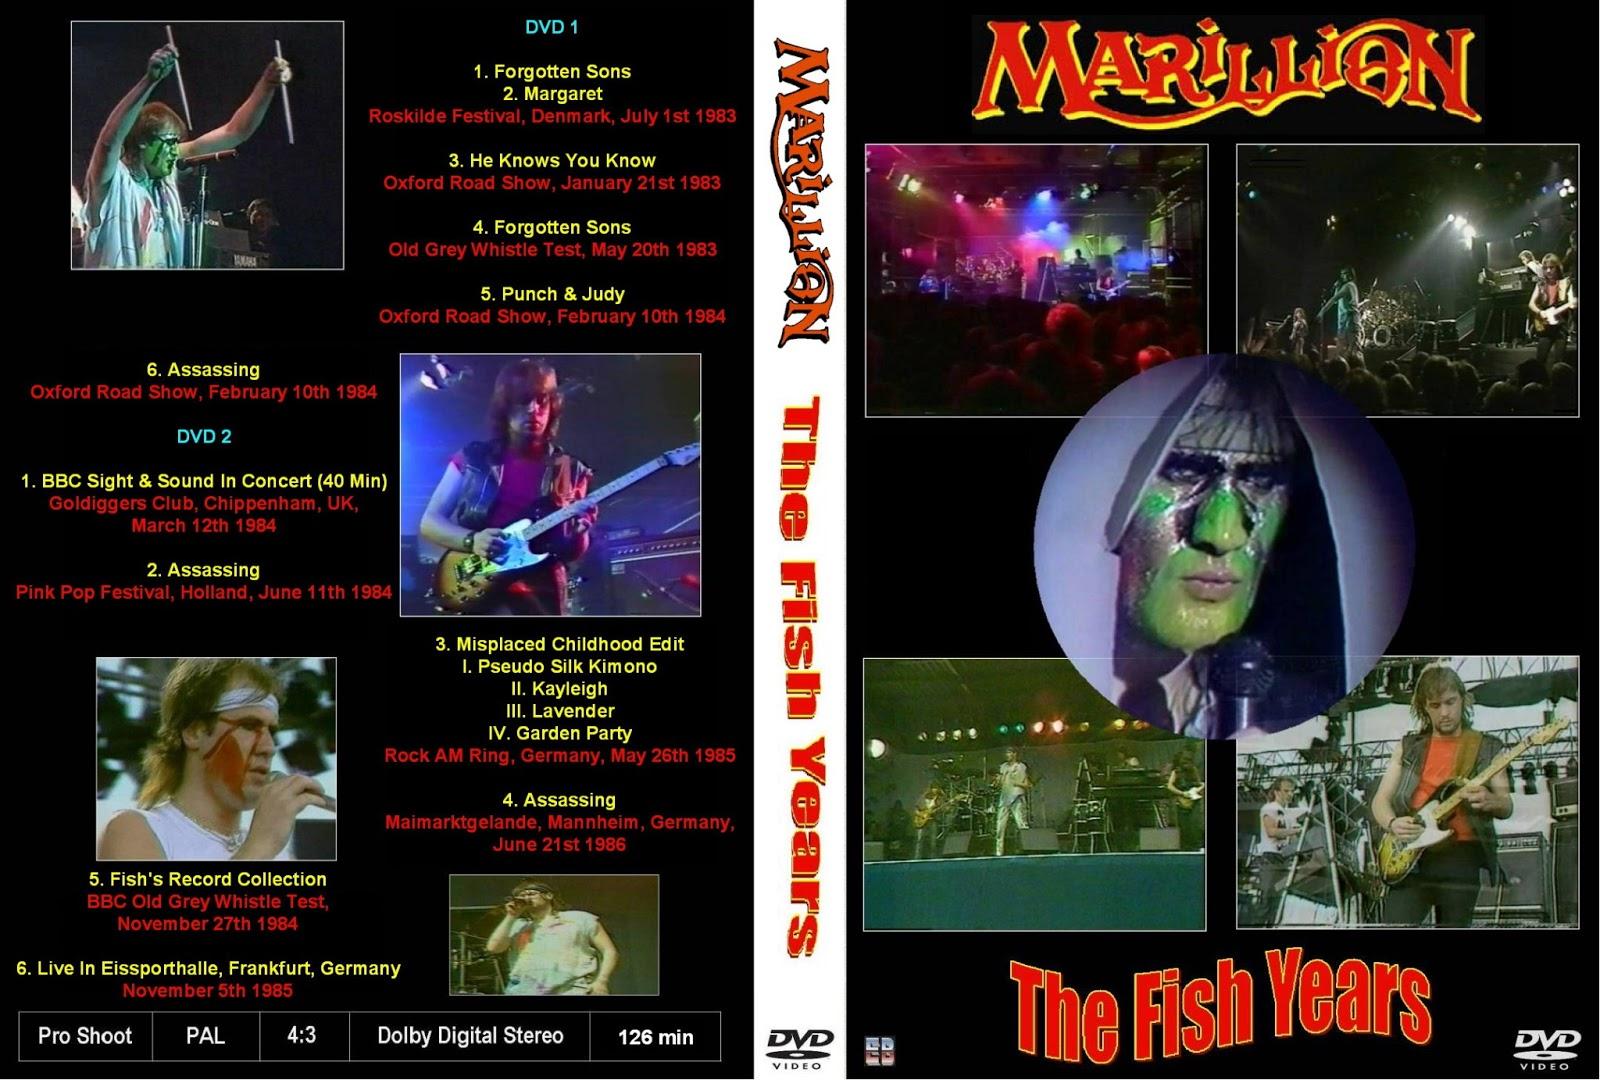 Marillion - Incubus (Live)